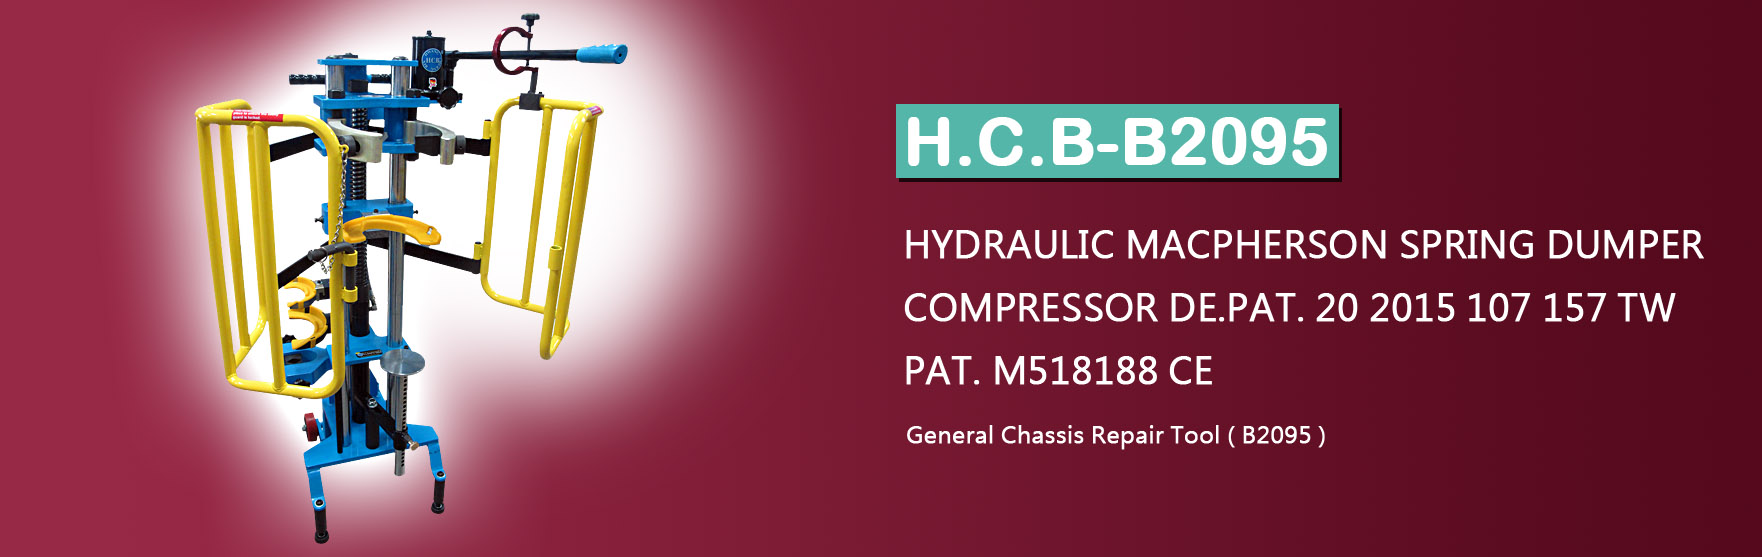 HCB Auto Tools - H C B-A1393 VOLVO (FM12) TRUCK INJECTOR